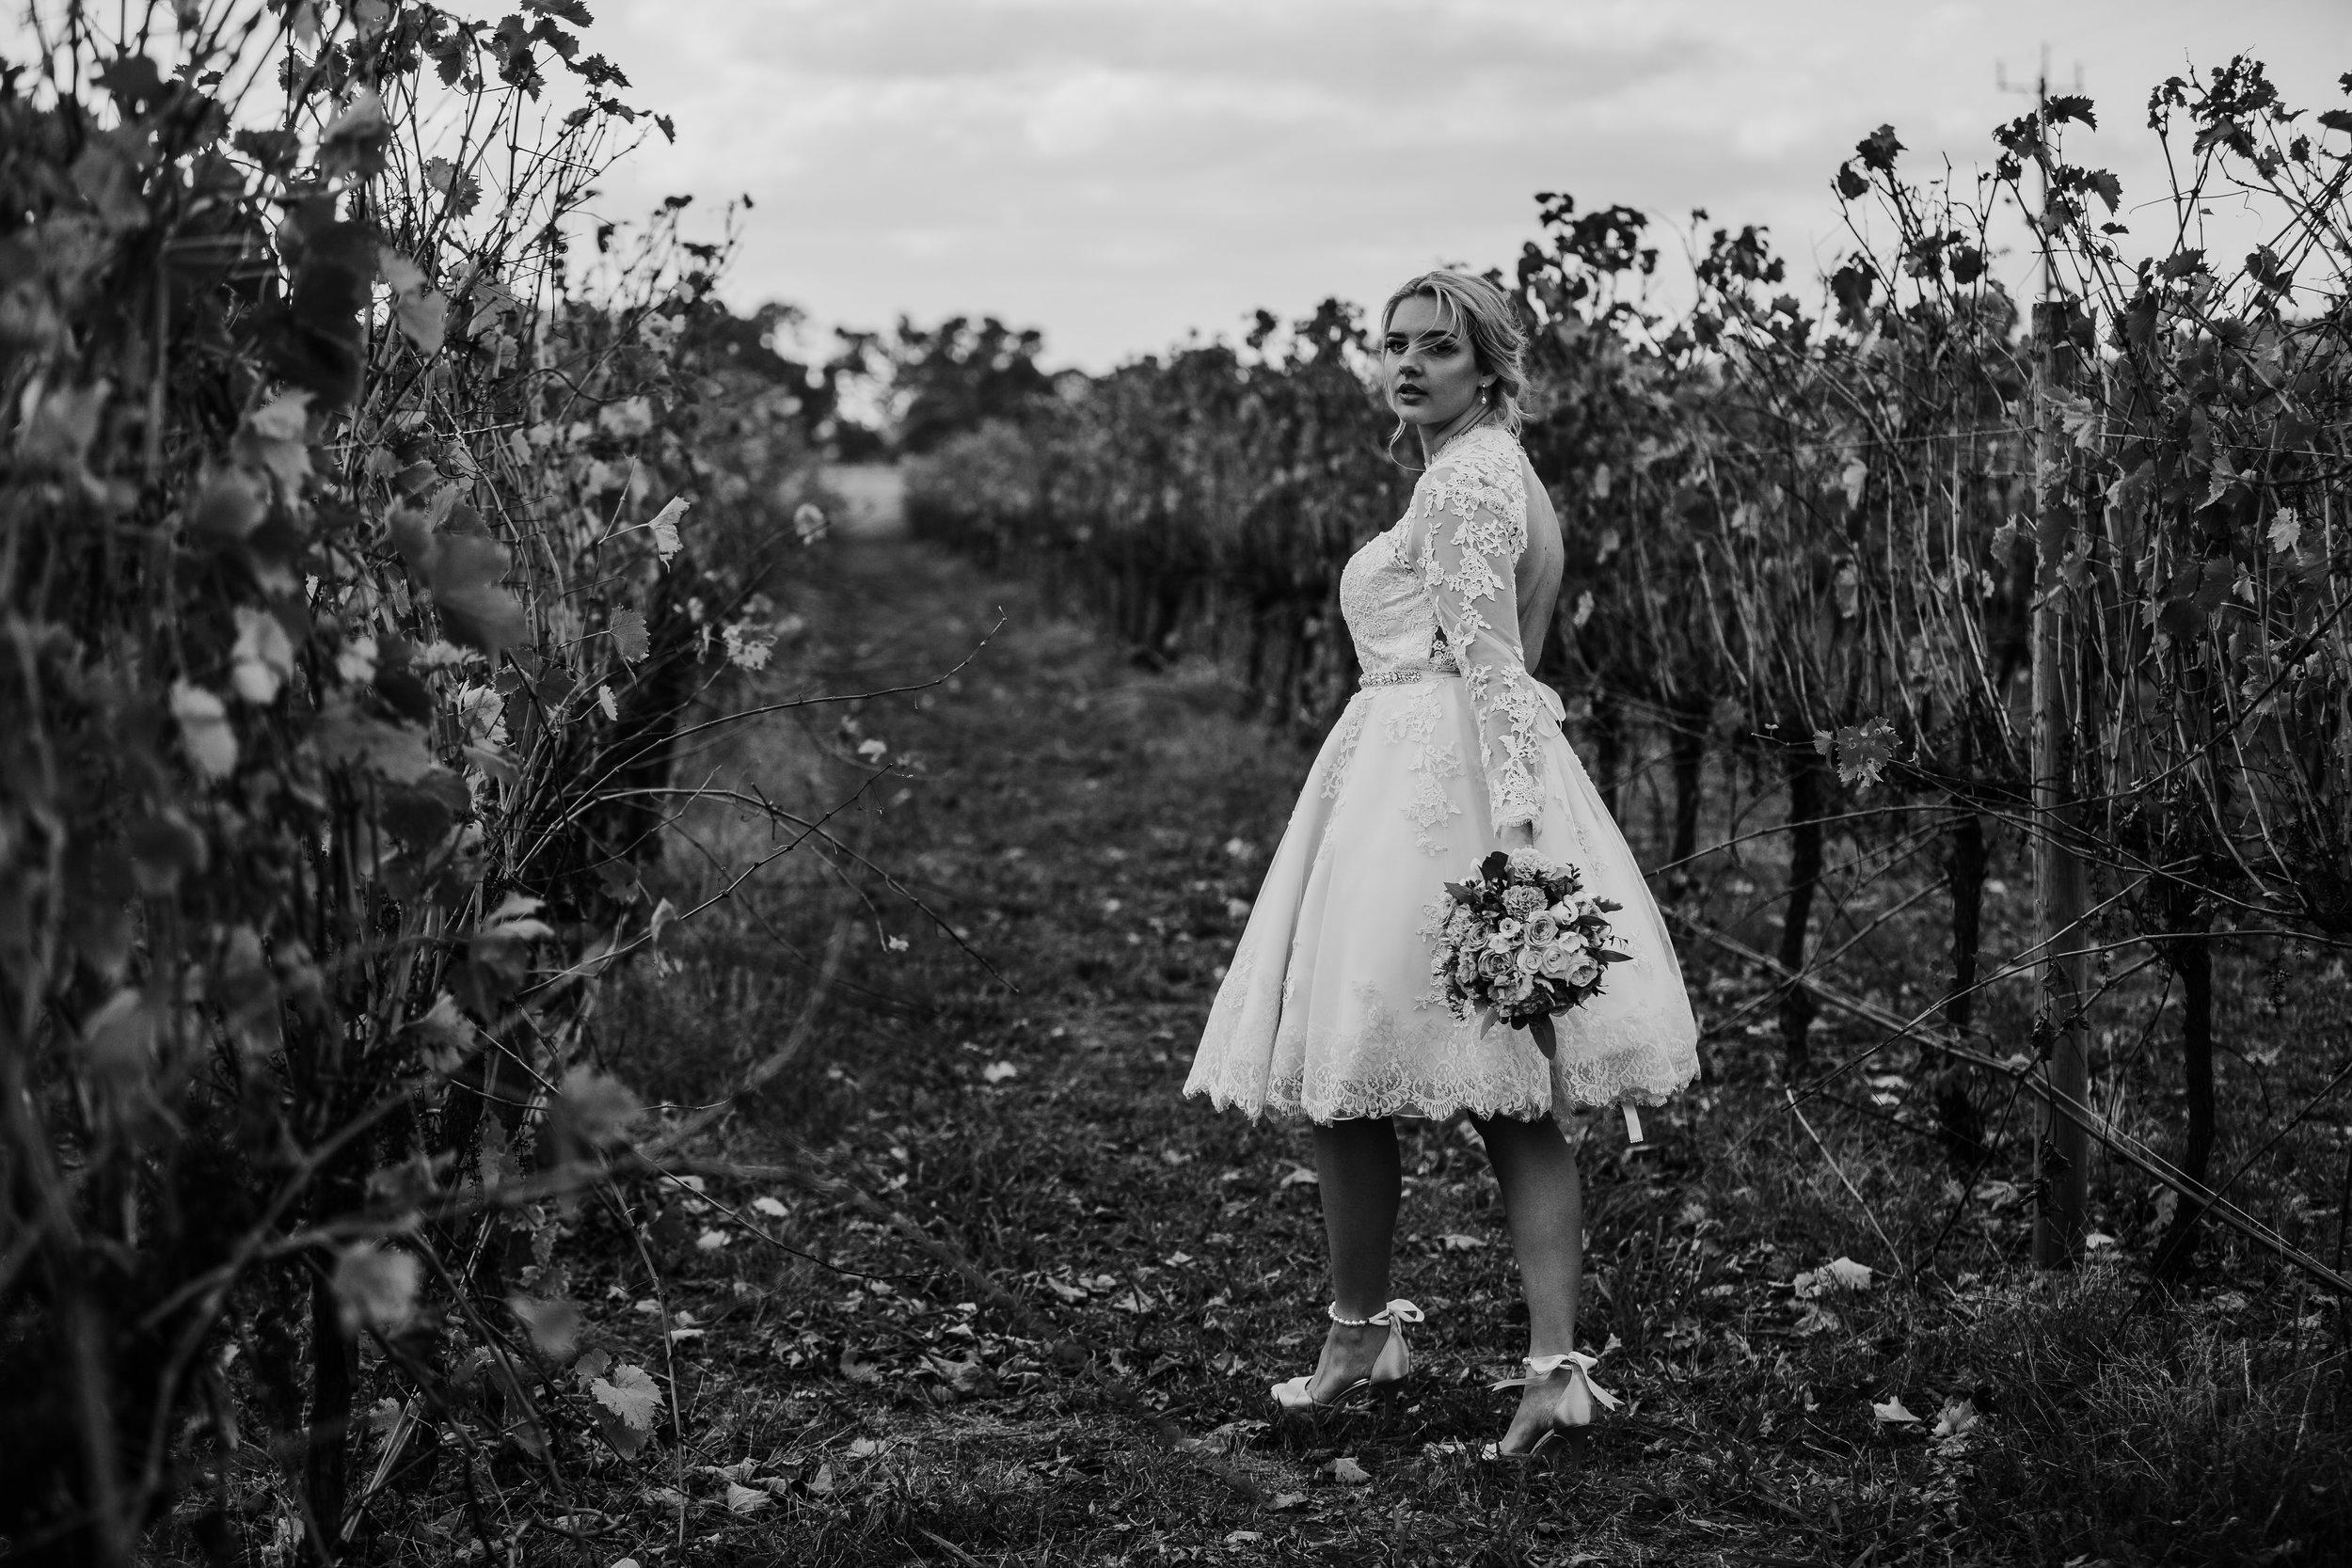 mickalathomas_puremacphotography_weddingphotographer_couplephotographer_Sheppartonphotographer_1487.jpg